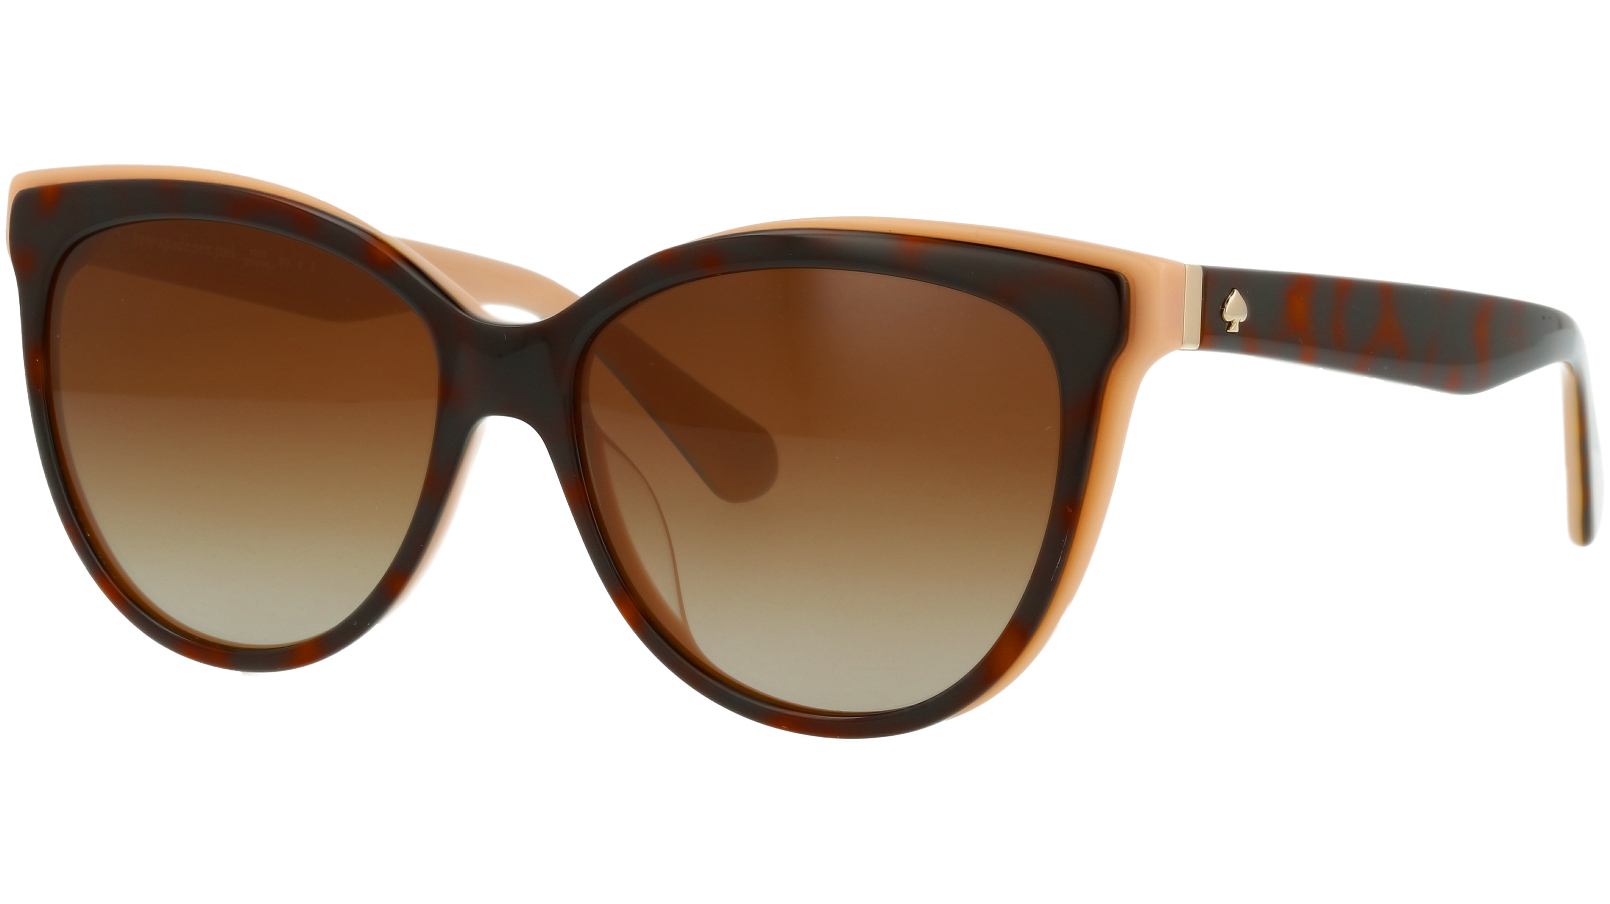 KATE SPADE DAESHA/S 0T4 56 HAVANA Sunglasses